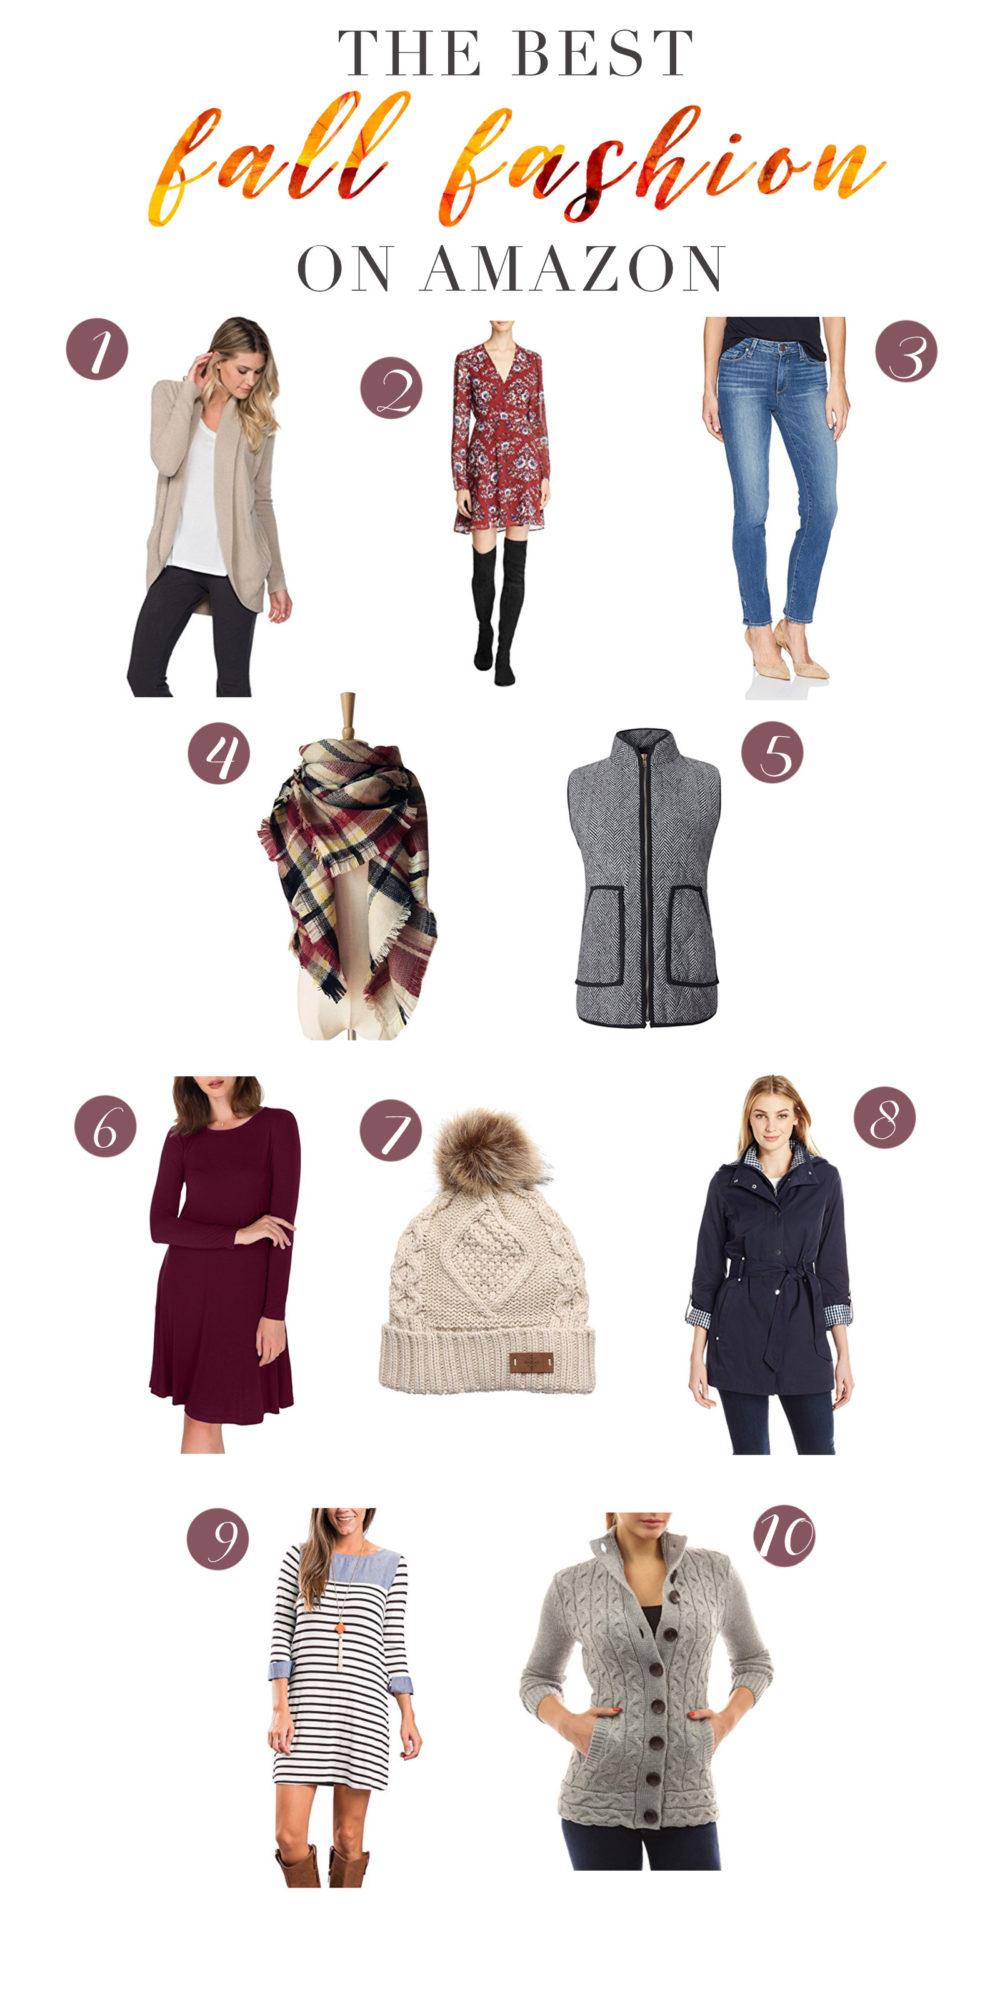 Petite Fashion and Style | The Best Fall Fashion on Amazon - The Best of Amazon Fall Fashion by popular Michigan petite fashion blogger The Blue Hydrangeas